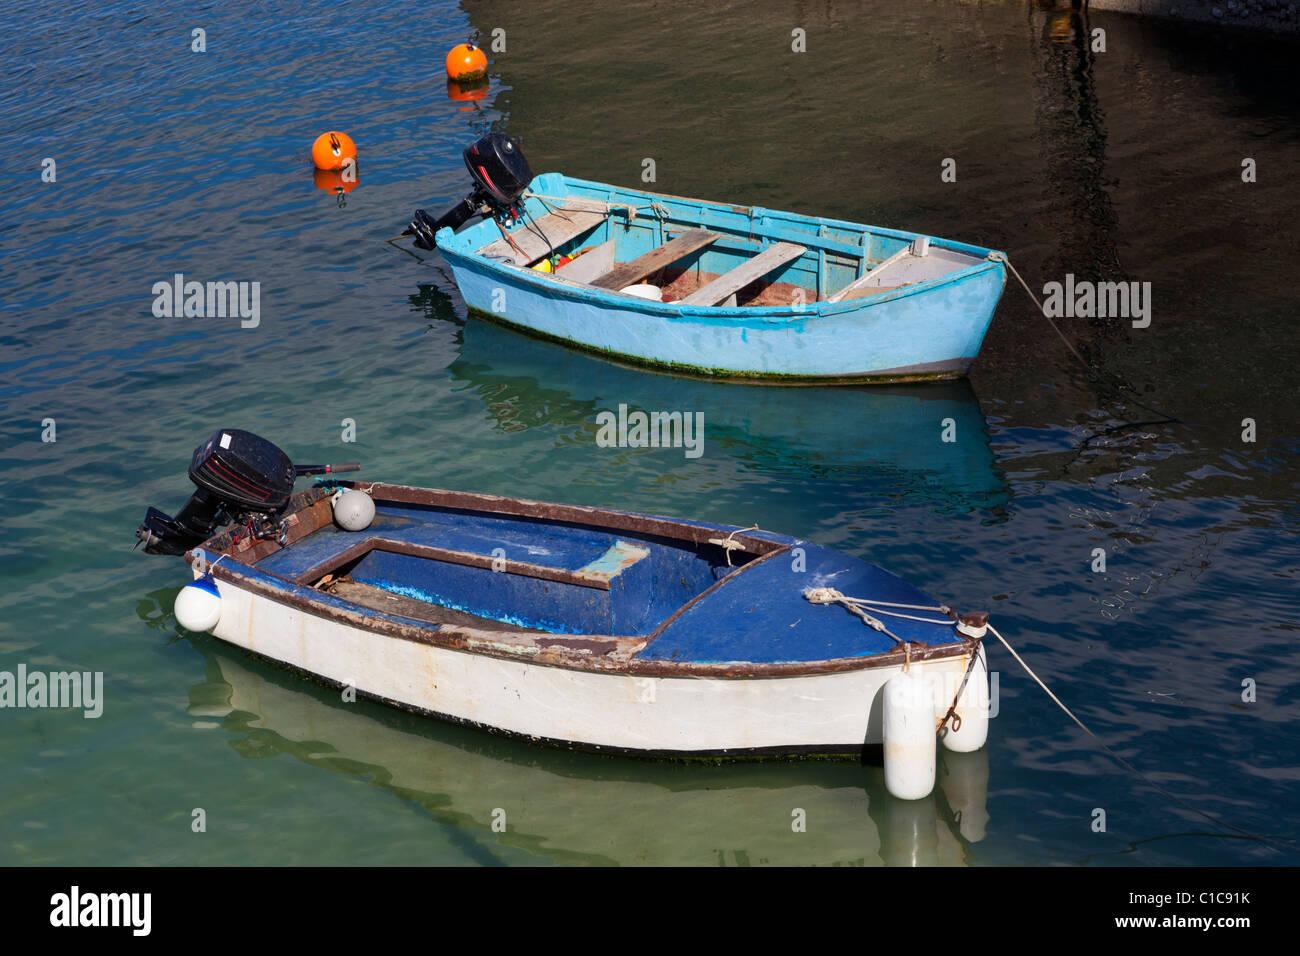 Fishing boats - Stock Image